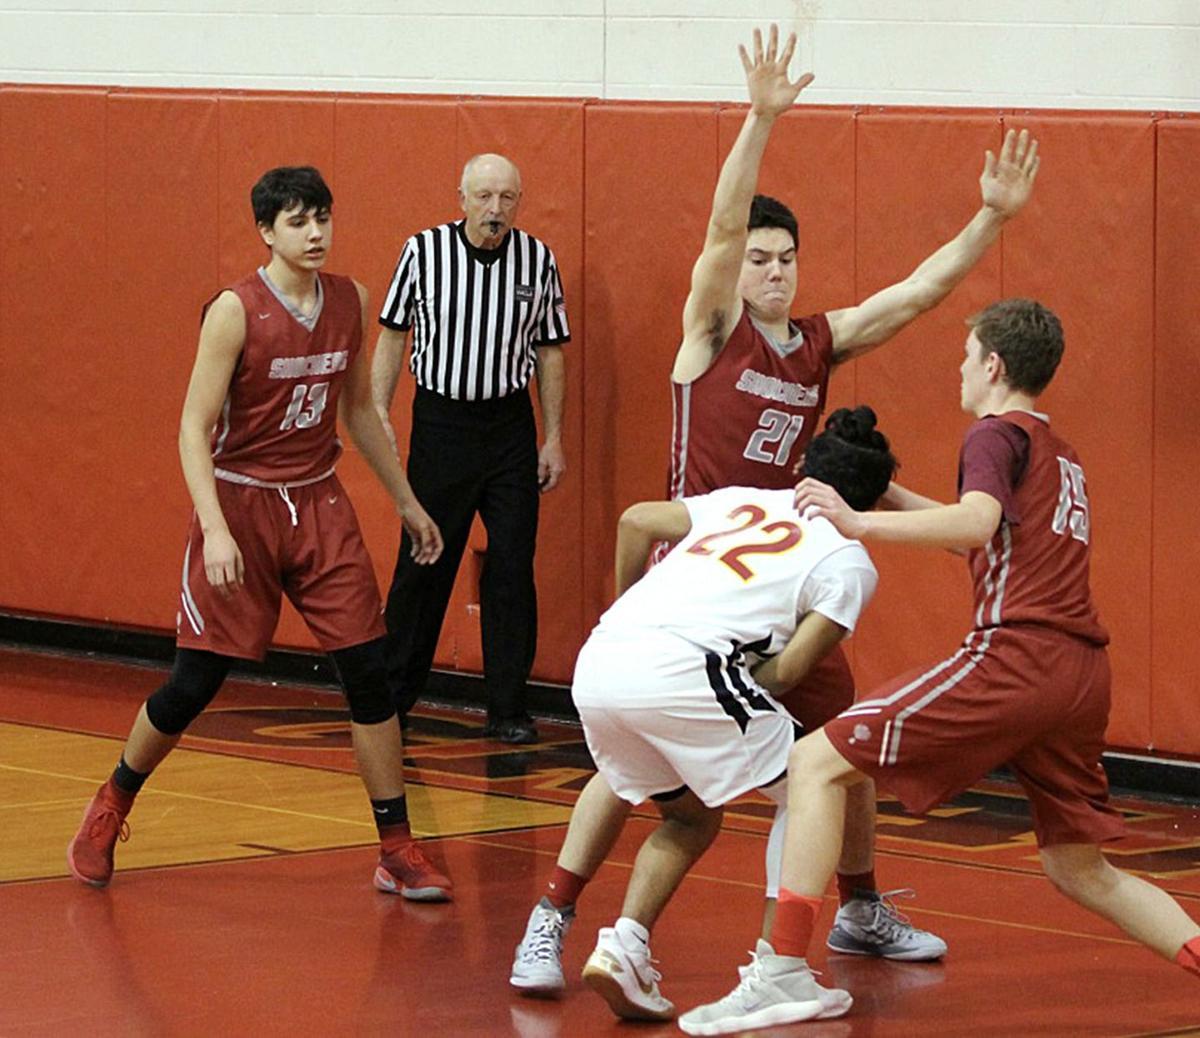 0222_ep_shocker boys basketball lake roosevelt 2